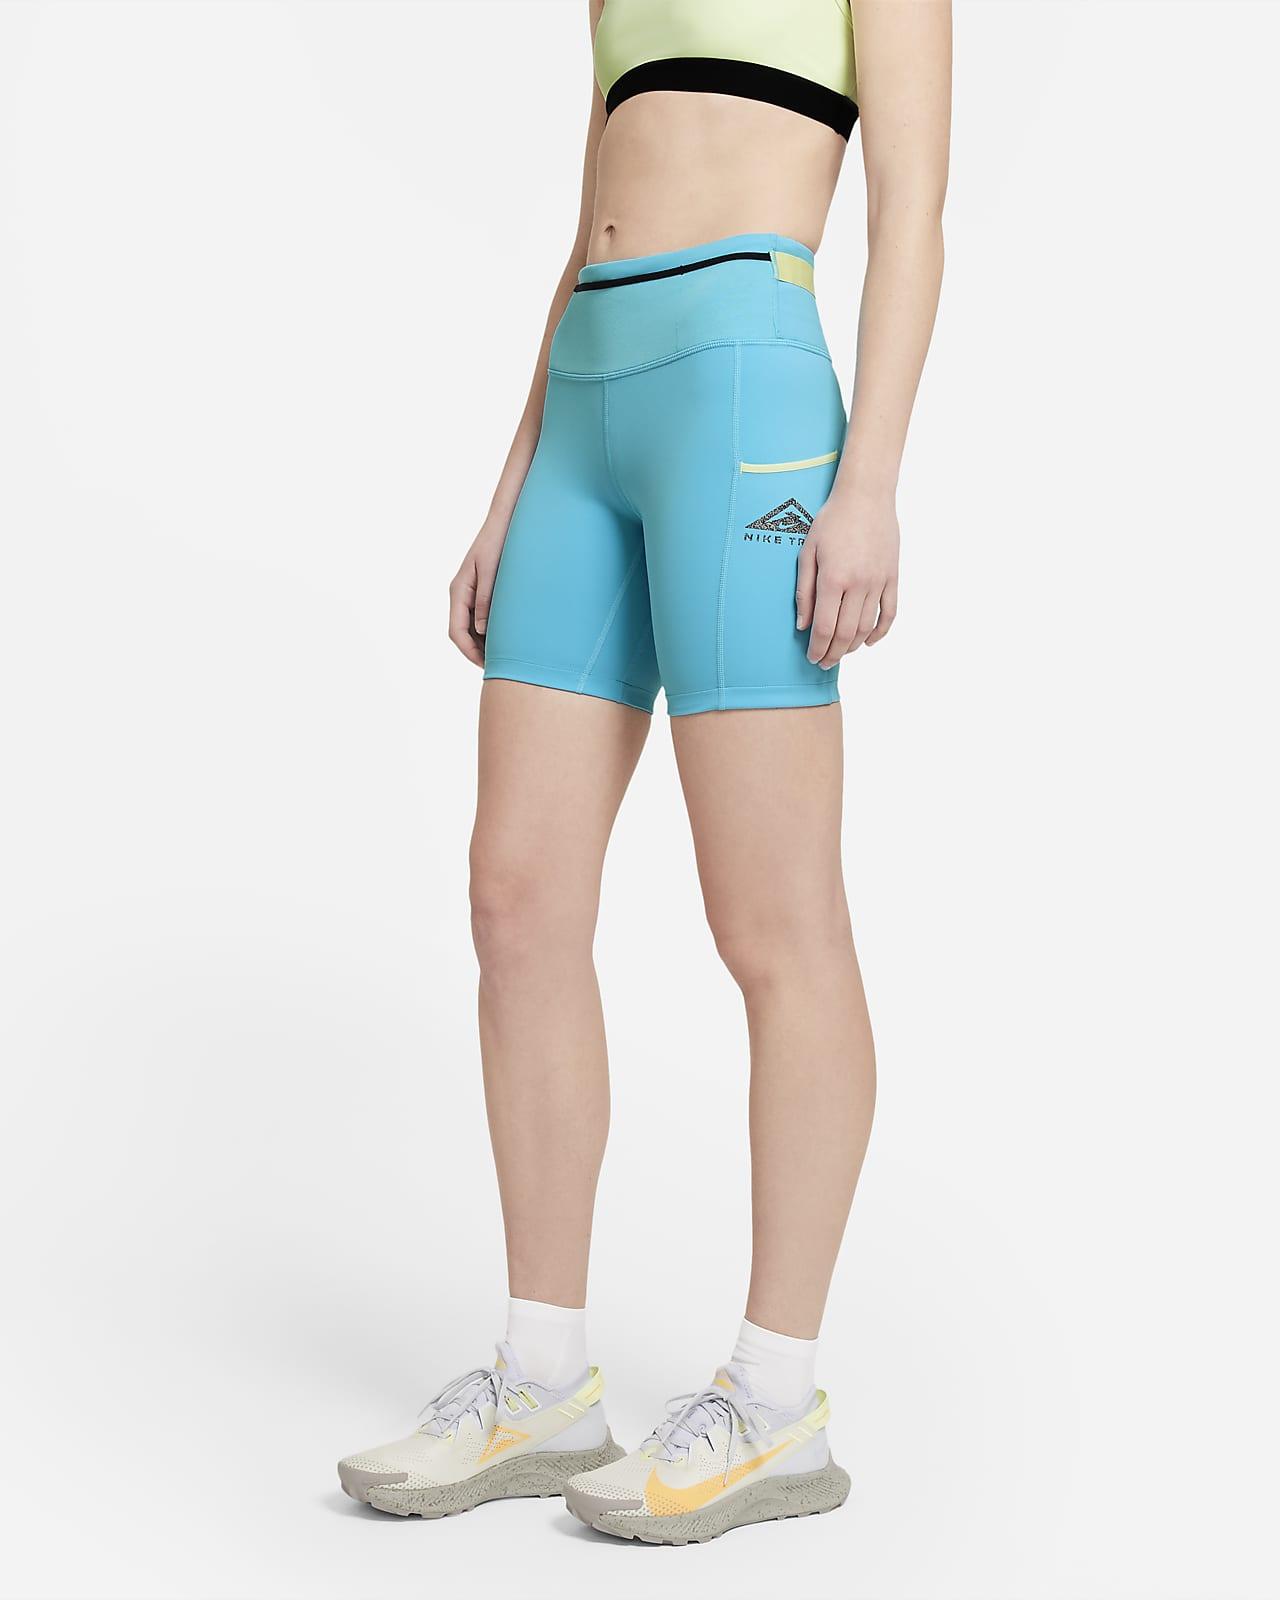 Nike Epic Luxe Women's Trail Running Shorts